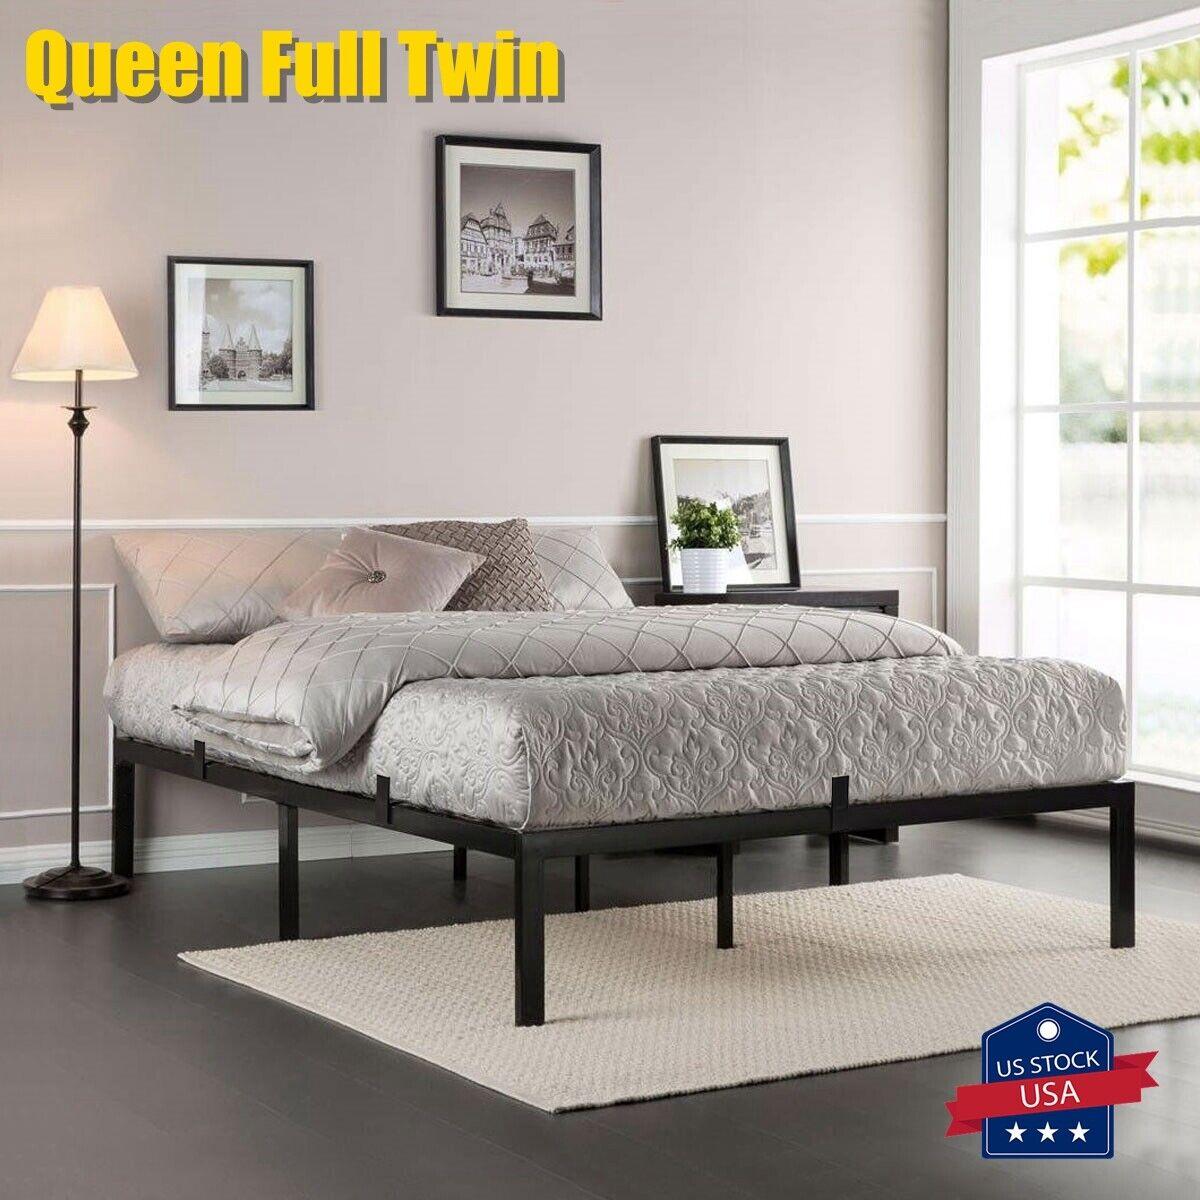 Queen Full Twin Size Metal Platform Bed Frame Heavy Duty Mat